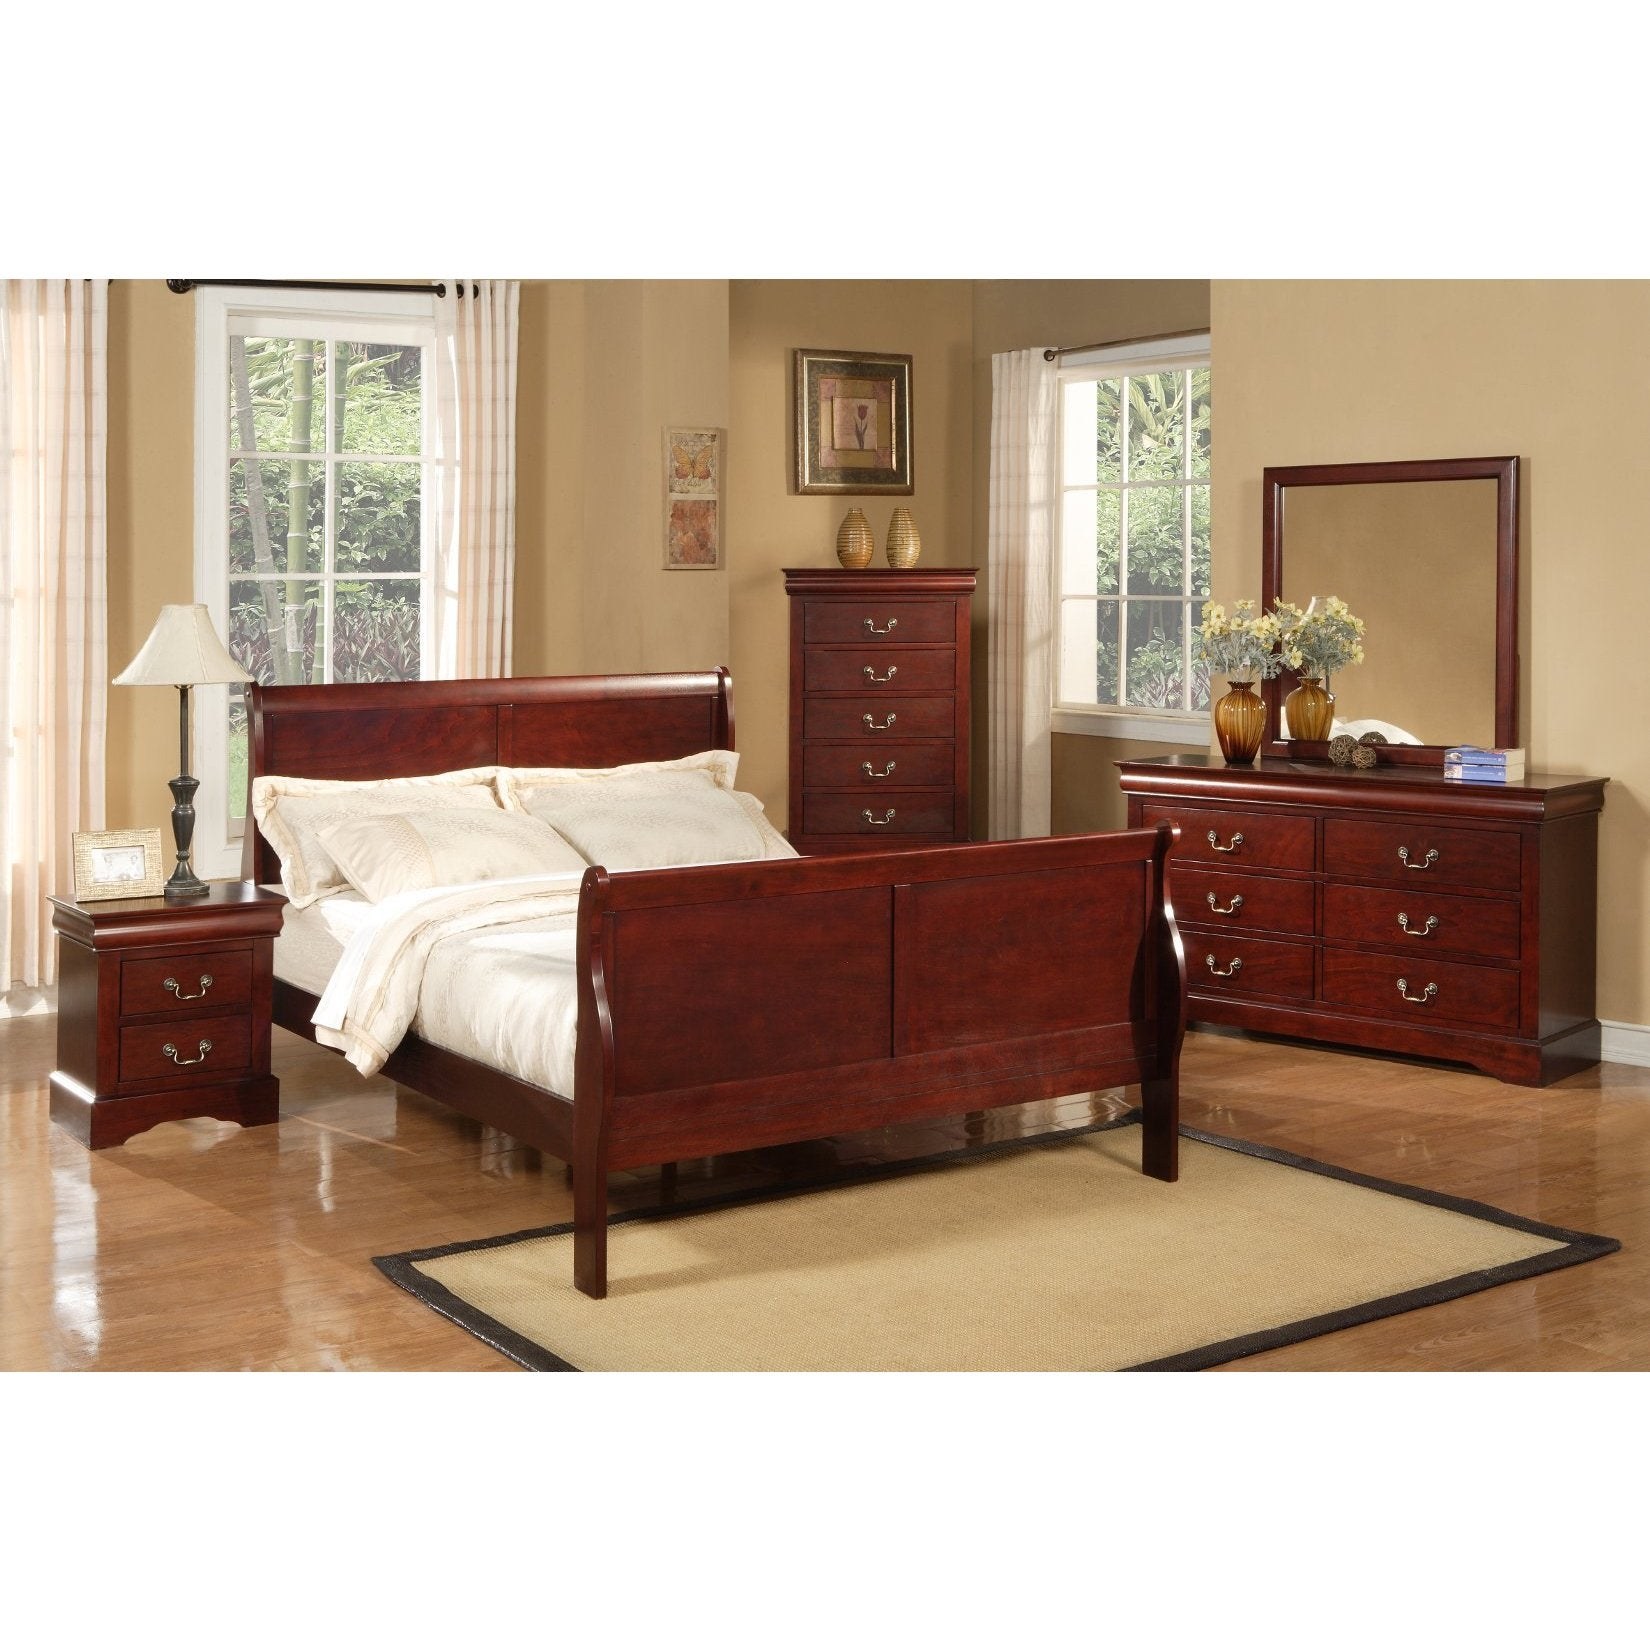 Alpine Furniture Louis Philippe II 4-piece Bedroom Set - ...